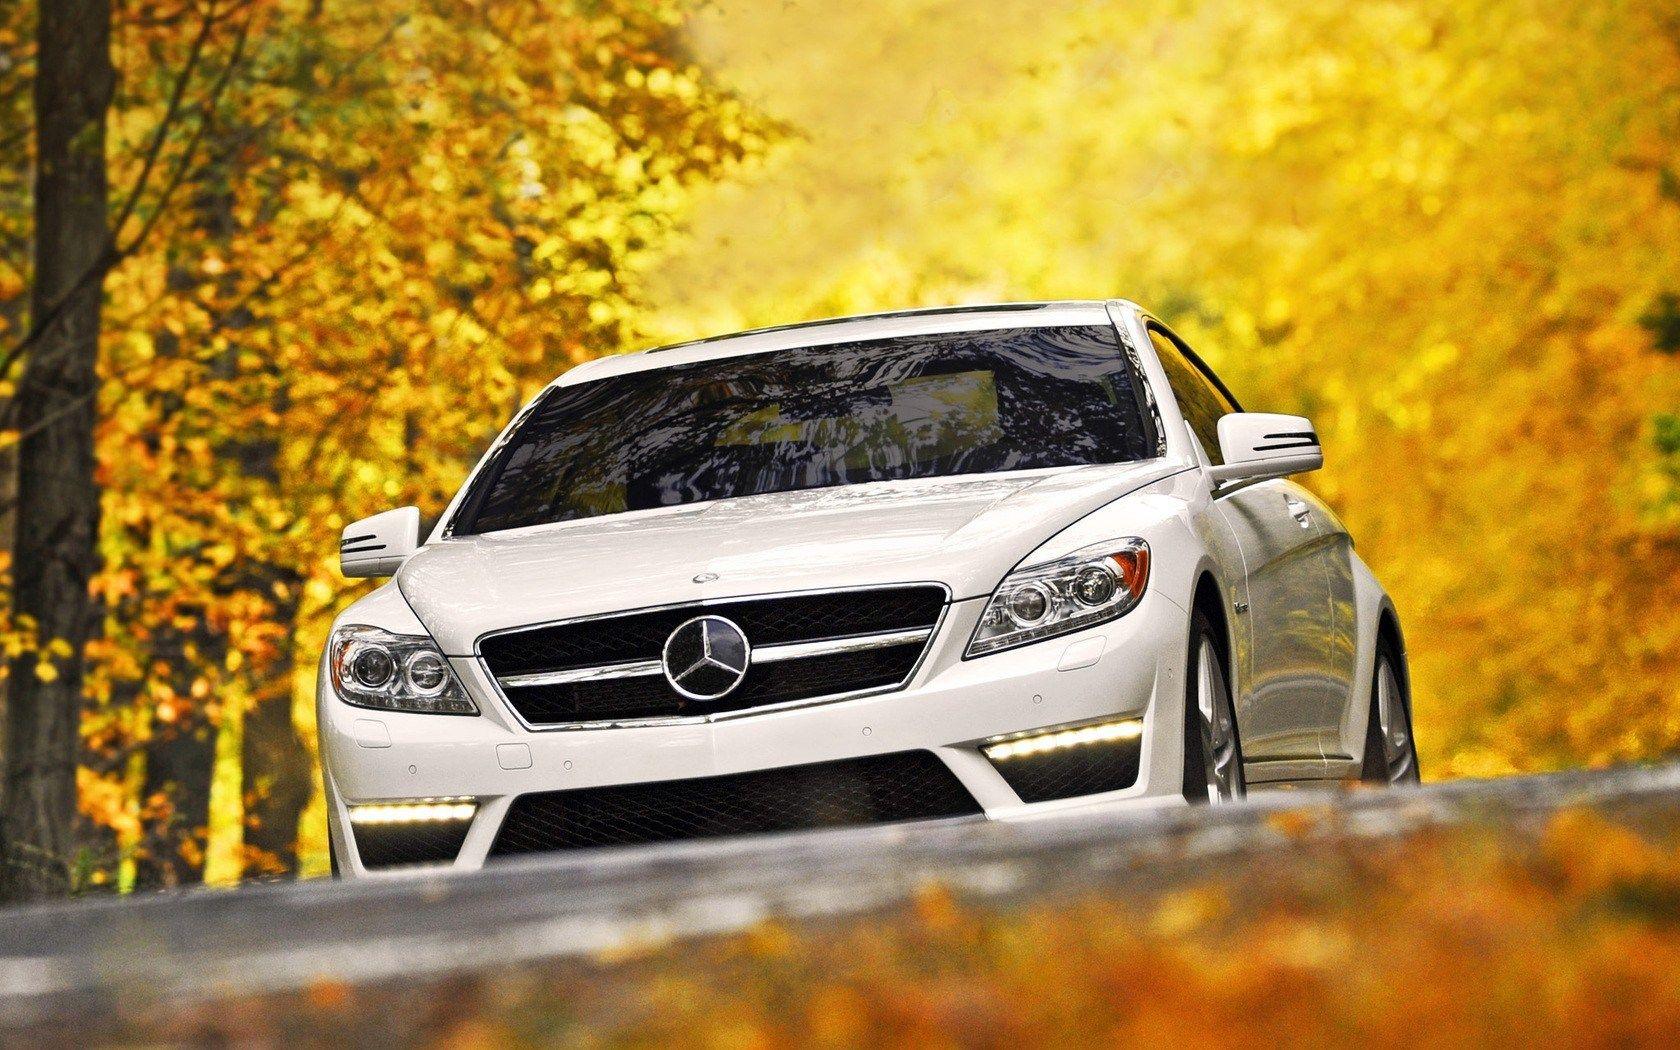 1680x1050 Free Desktop Wallpaper Downloads Mercedes Scream